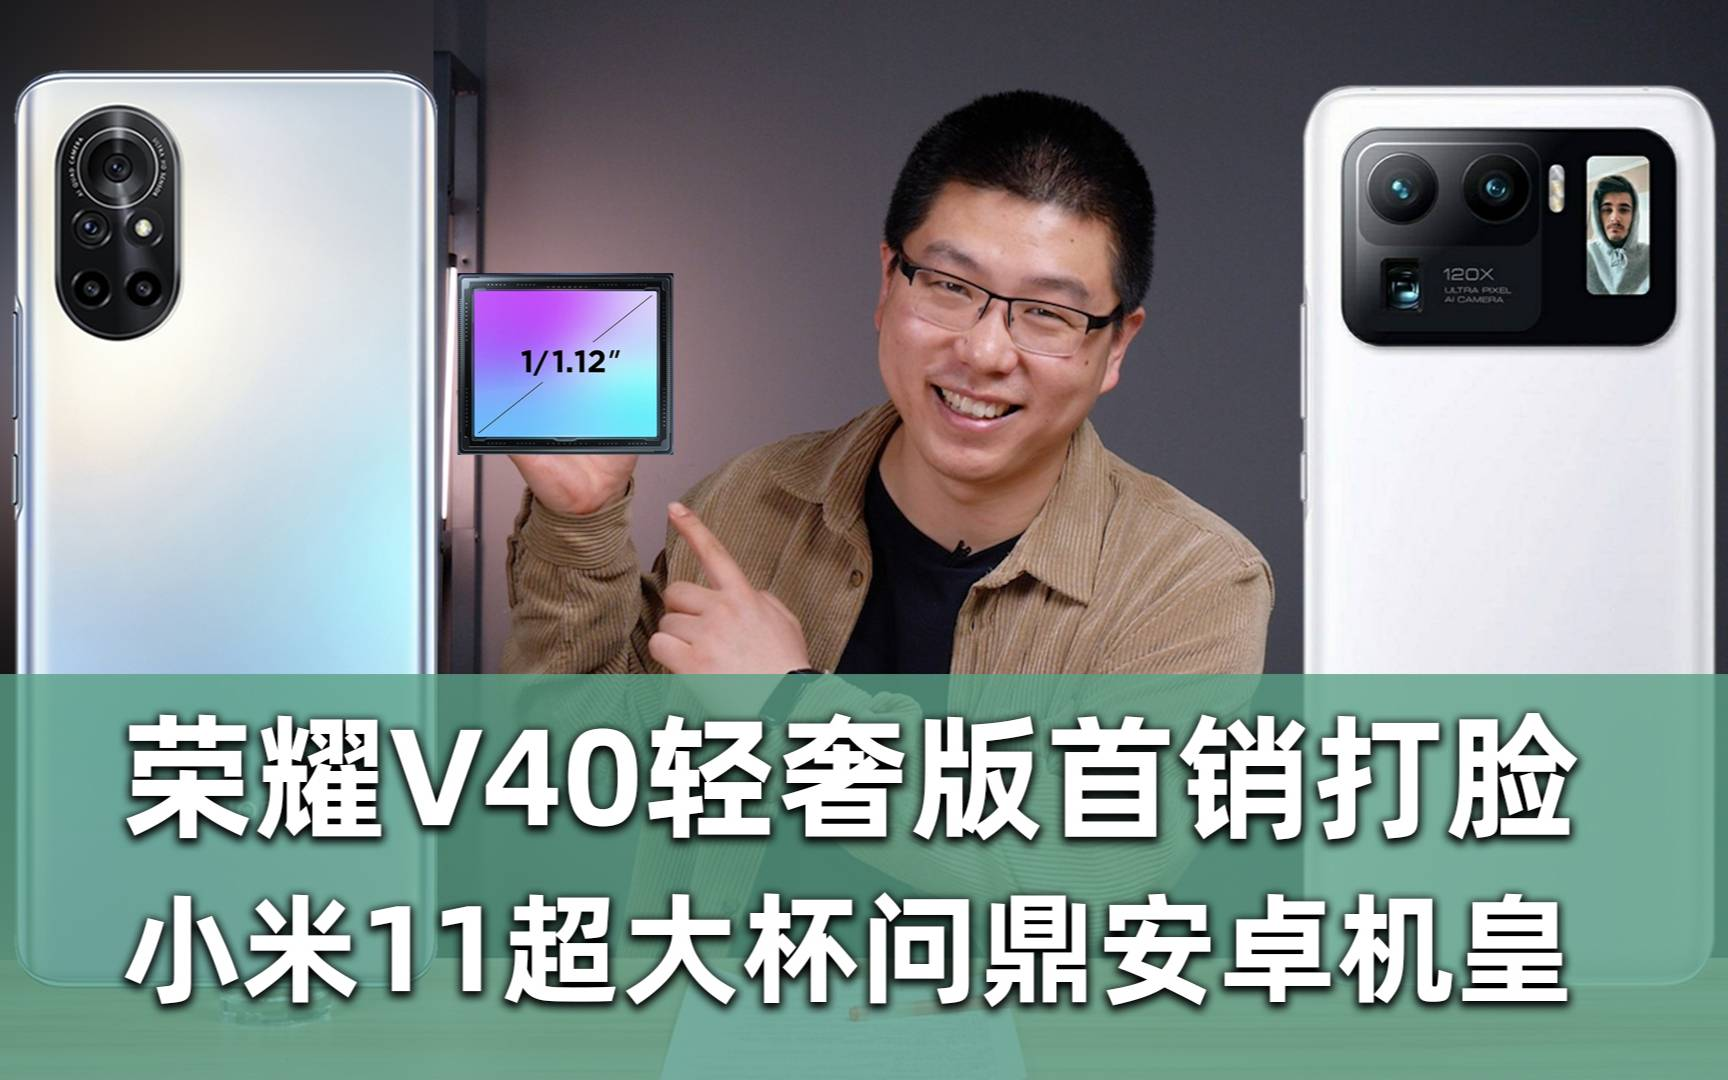 【E周报】54:荣耀V40轻奢版首销打脸,小米11超大杯问鼎机皇